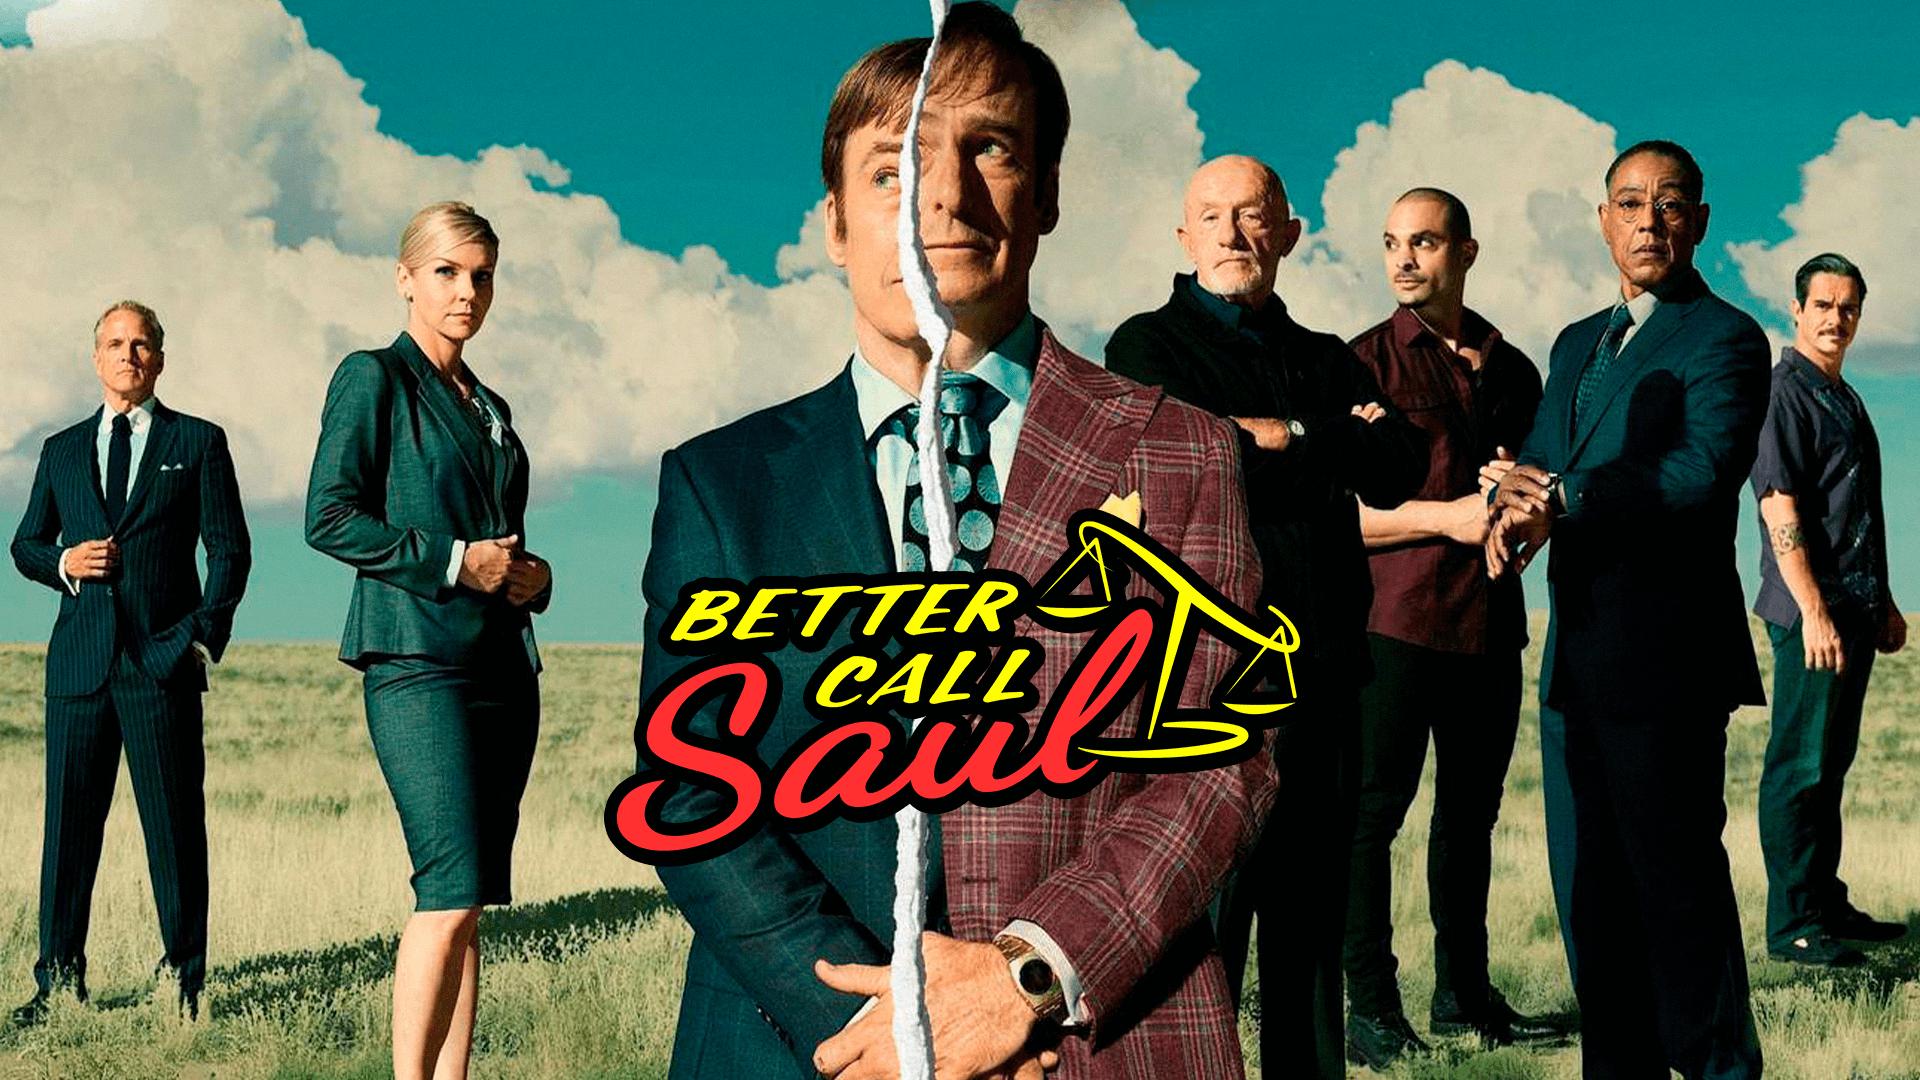 A sexta e última temporada de Better Call Saul que vai fechar o universo de Breaking Bad, teve a estreia adiada para o início de 2022.